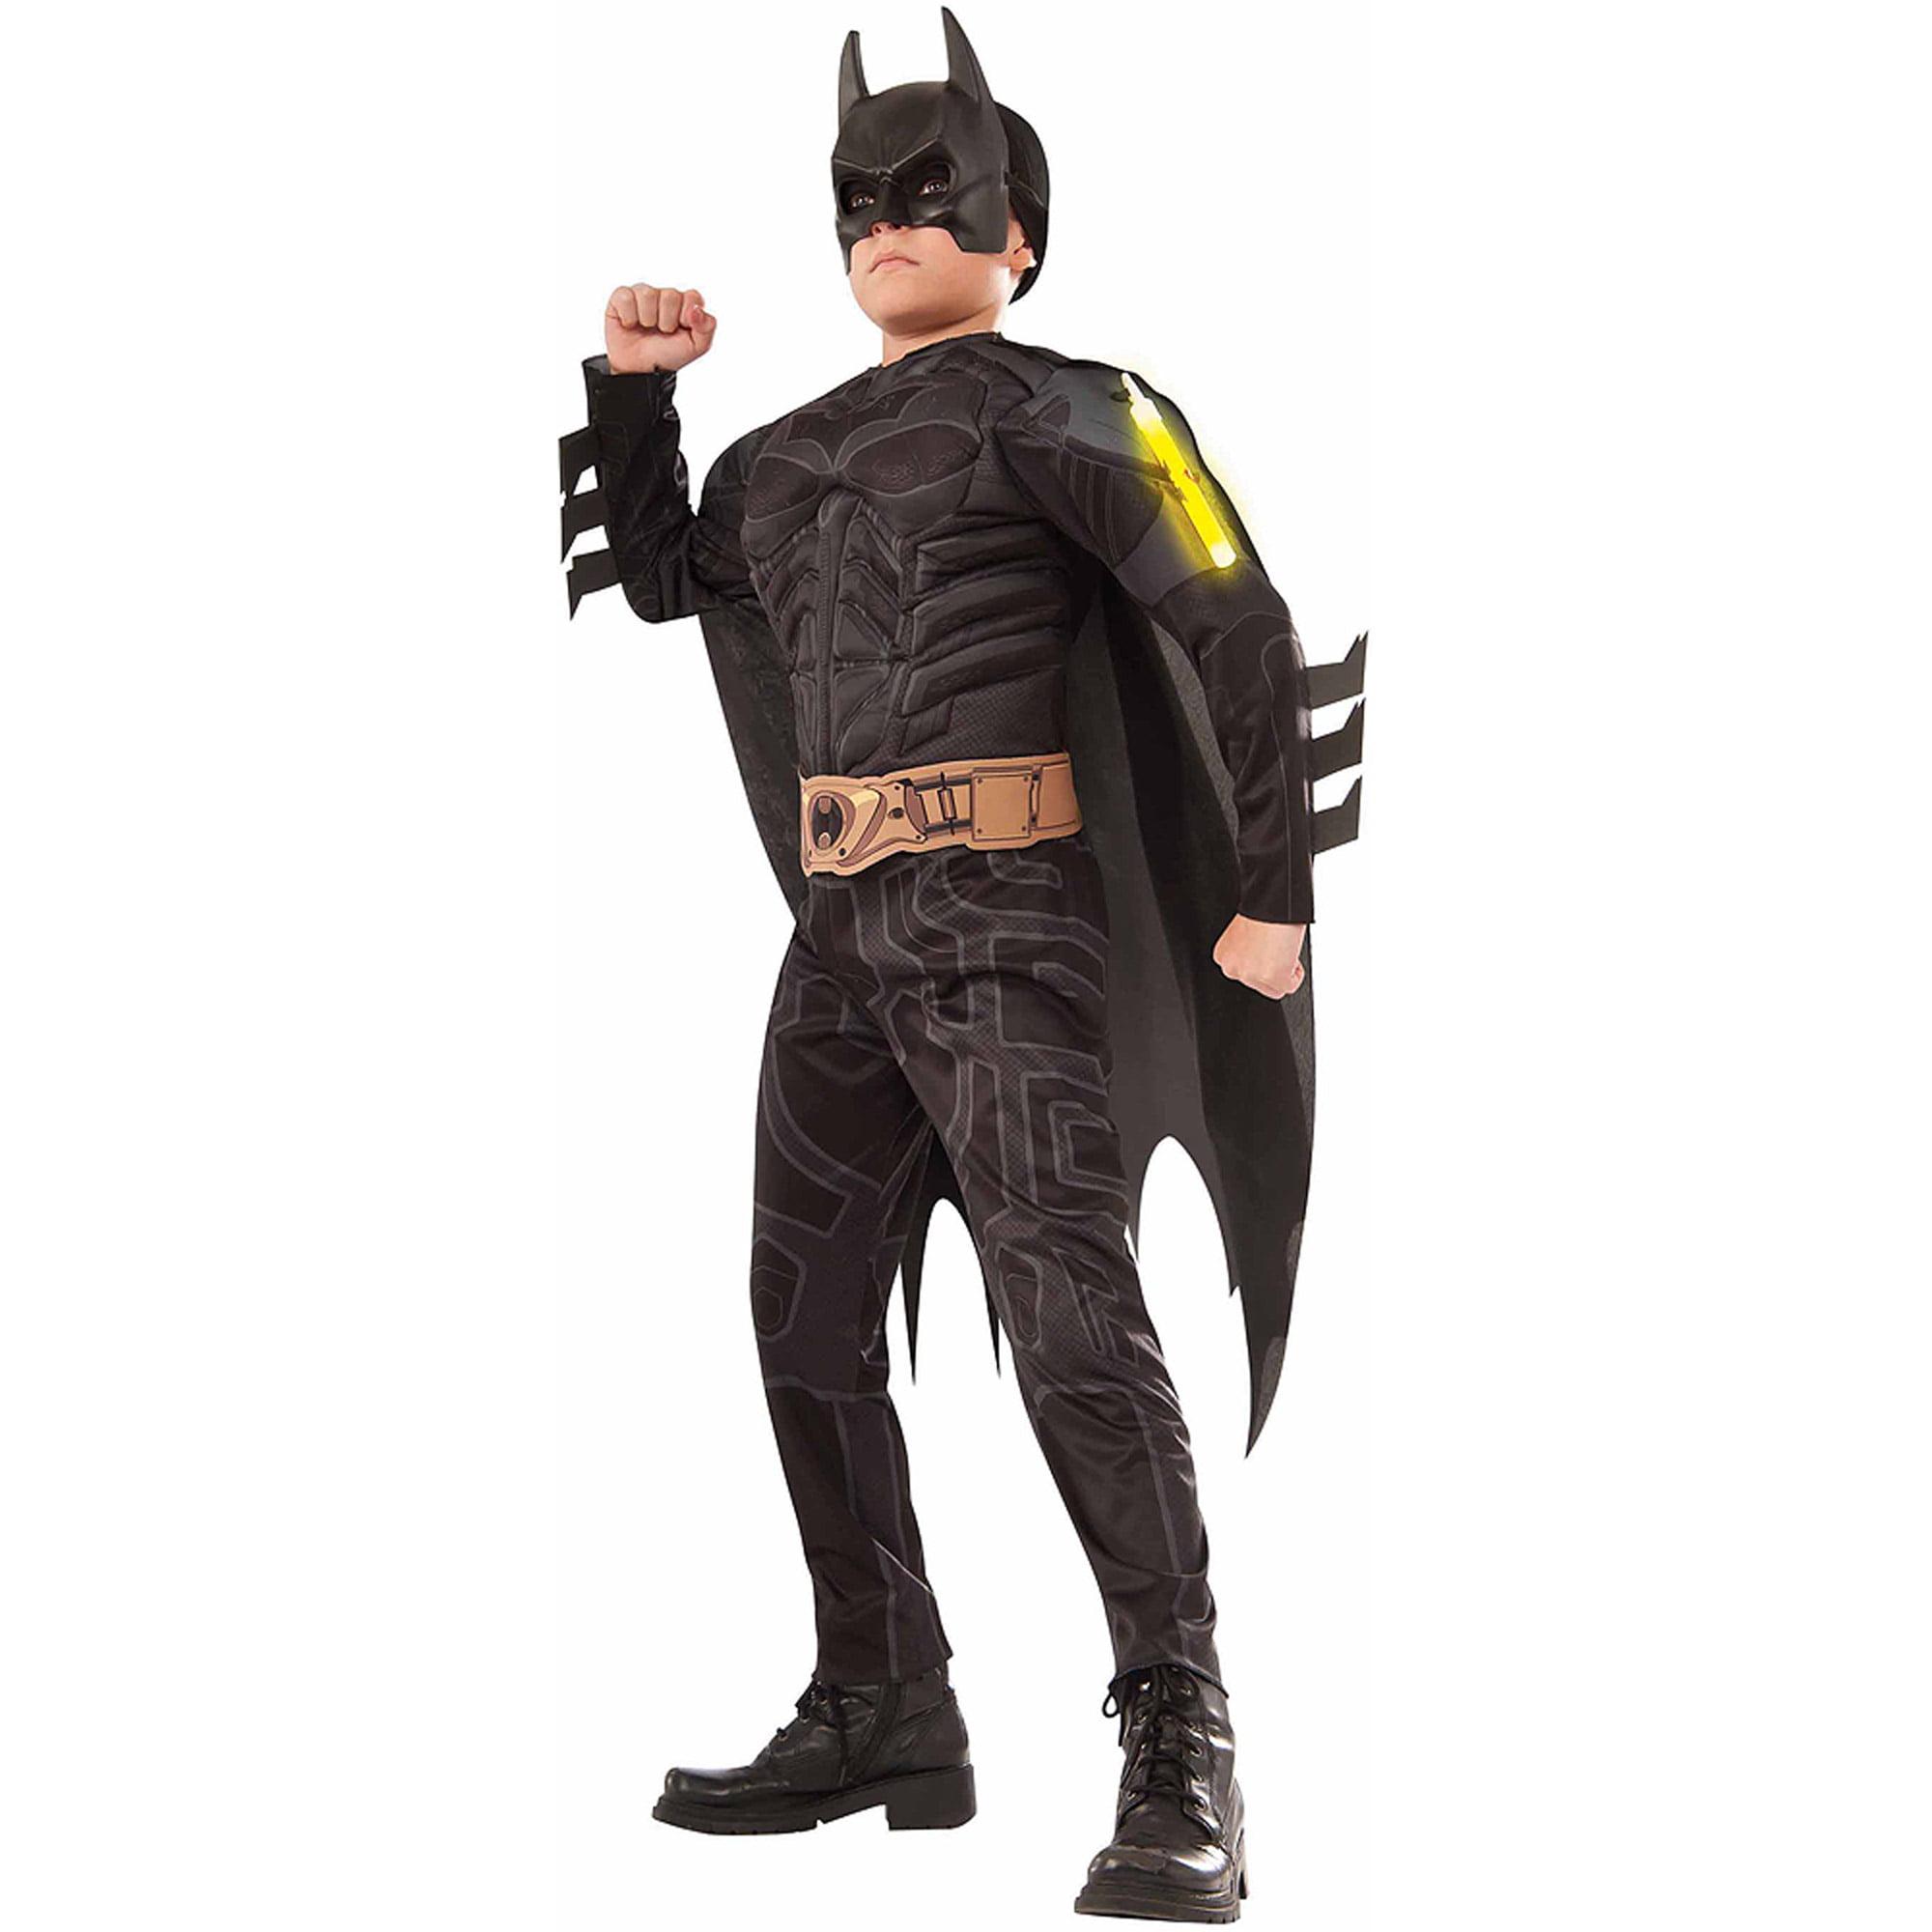 Batman Toddler Halloween Costume